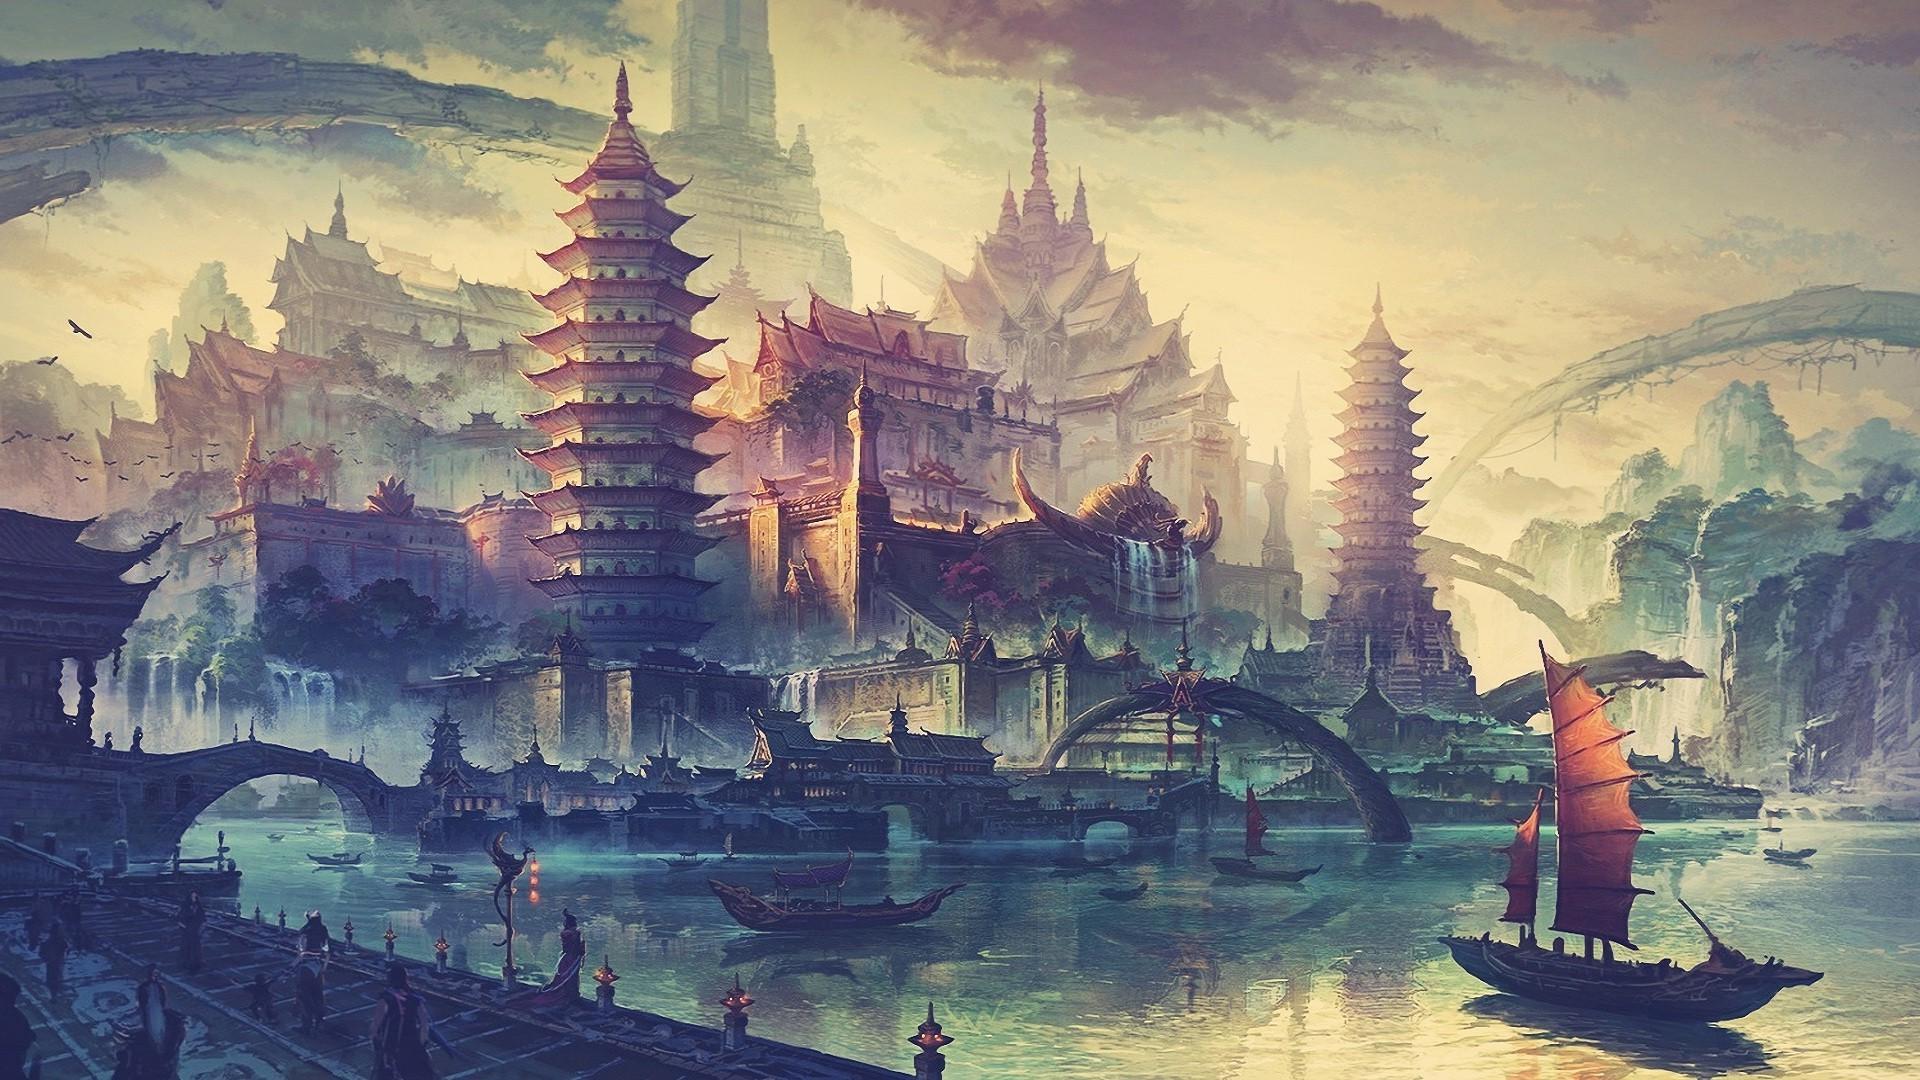 Drawing Painting Illustration Ship Boat Fantasy Art City Cityscape Water Evening Tower Landmark Screenshot 1920x1080 Px